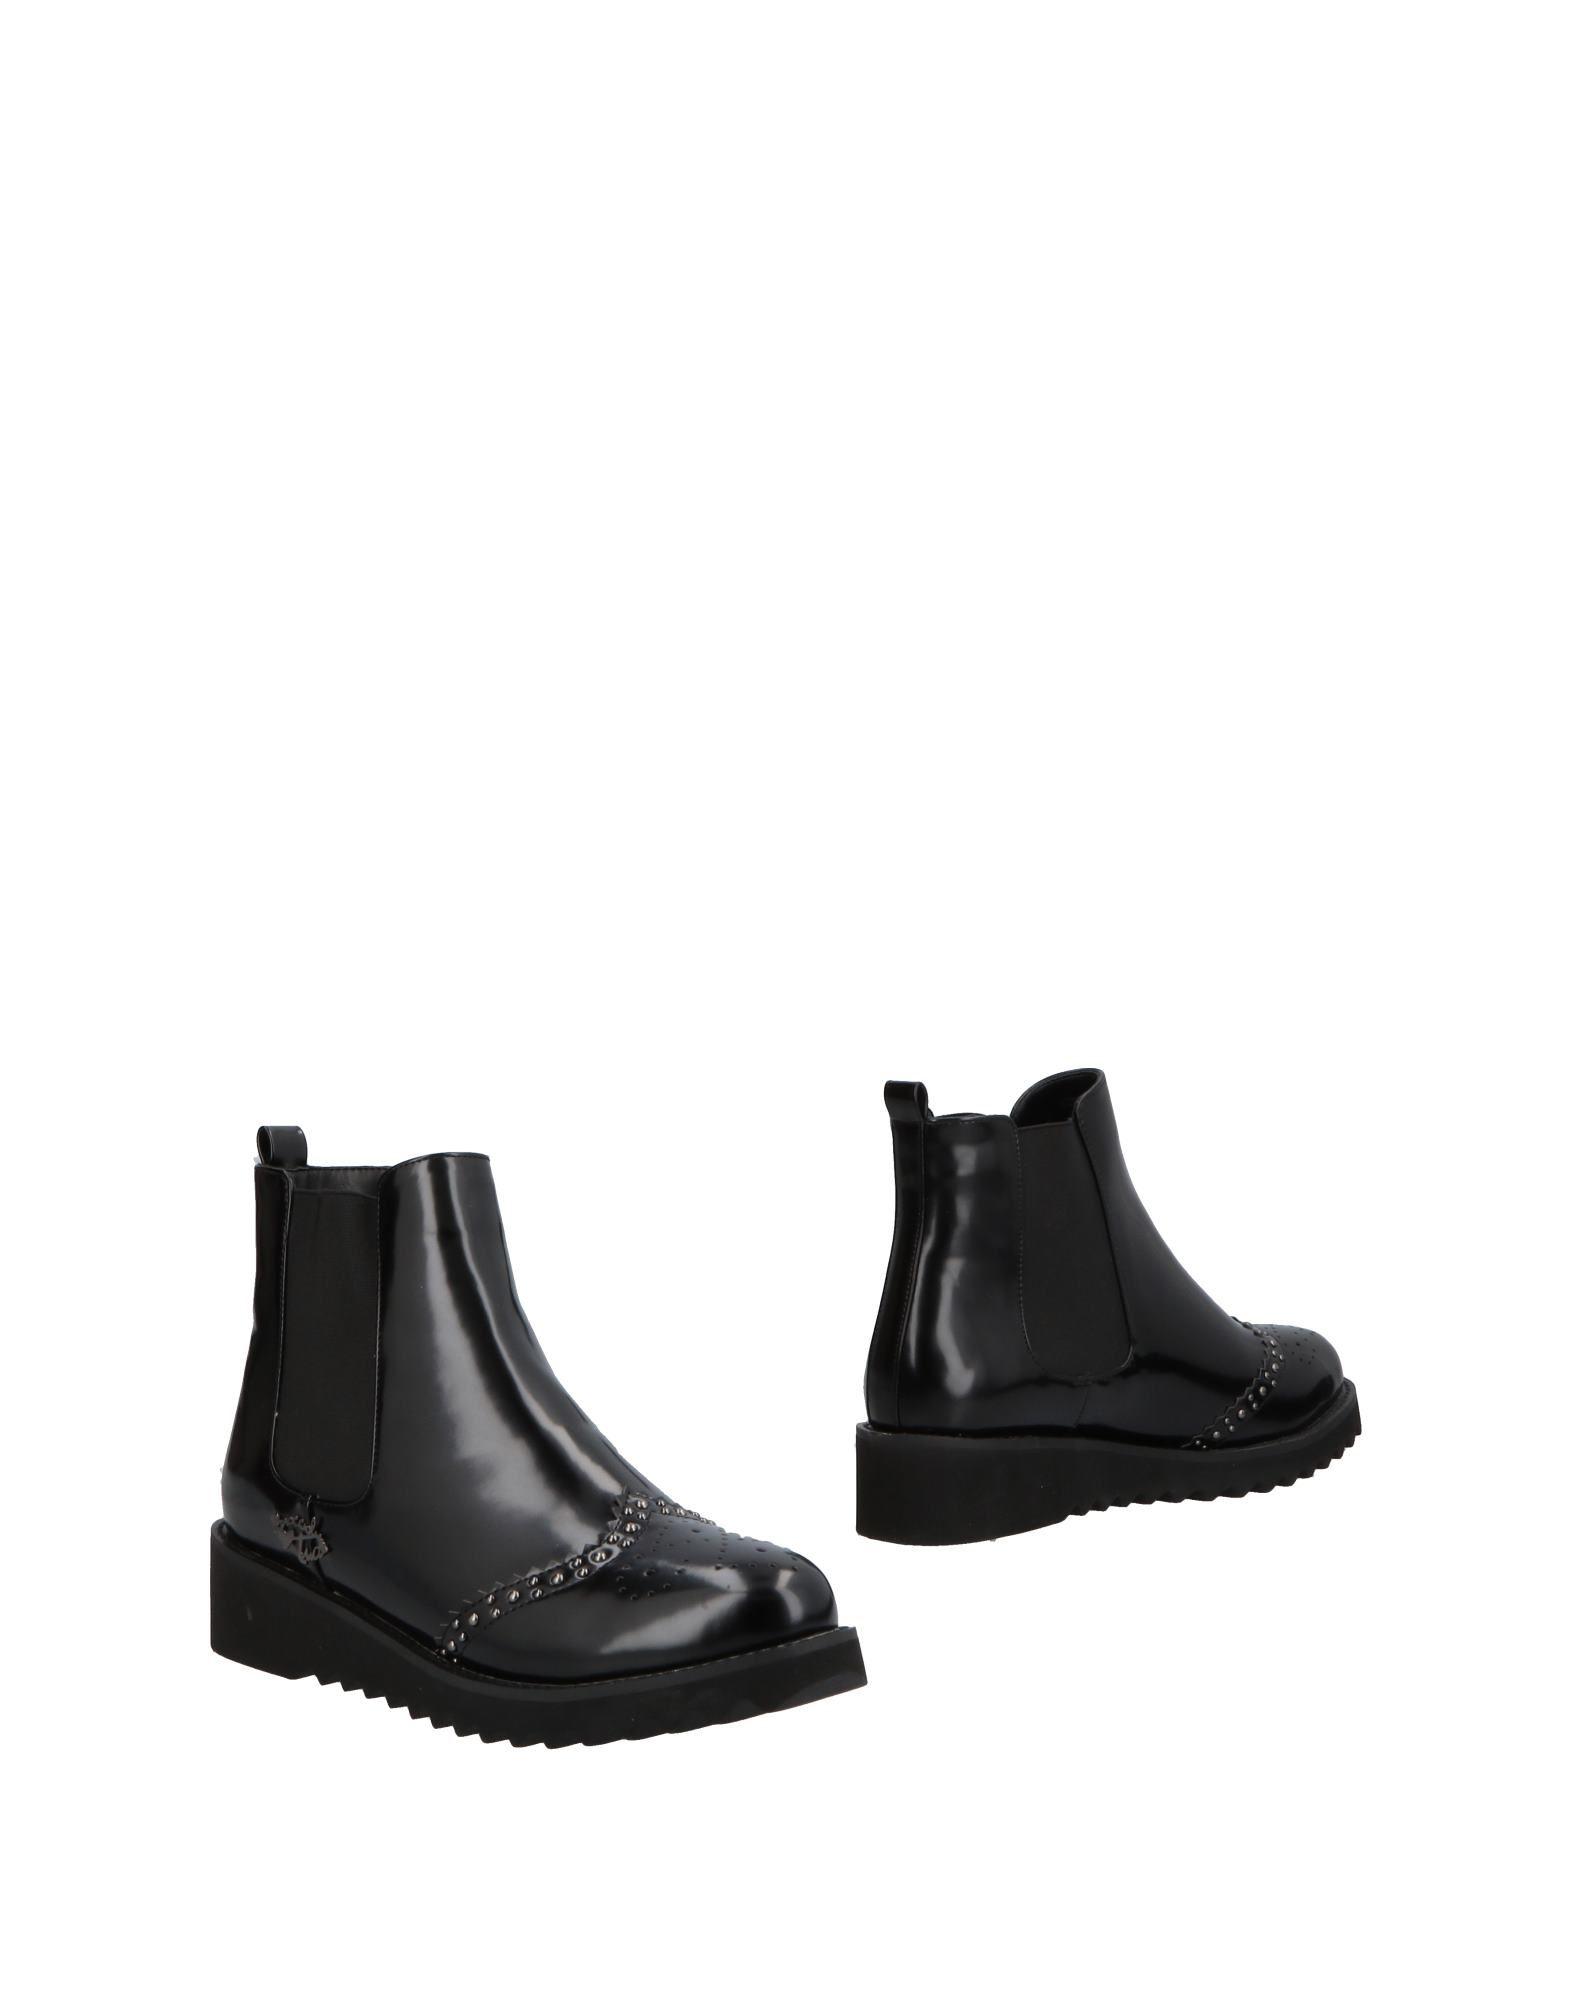 Tua By Braccialini Chelsea Boots Damen Heiße  11507239UO Heiße Damen Schuhe 97933c